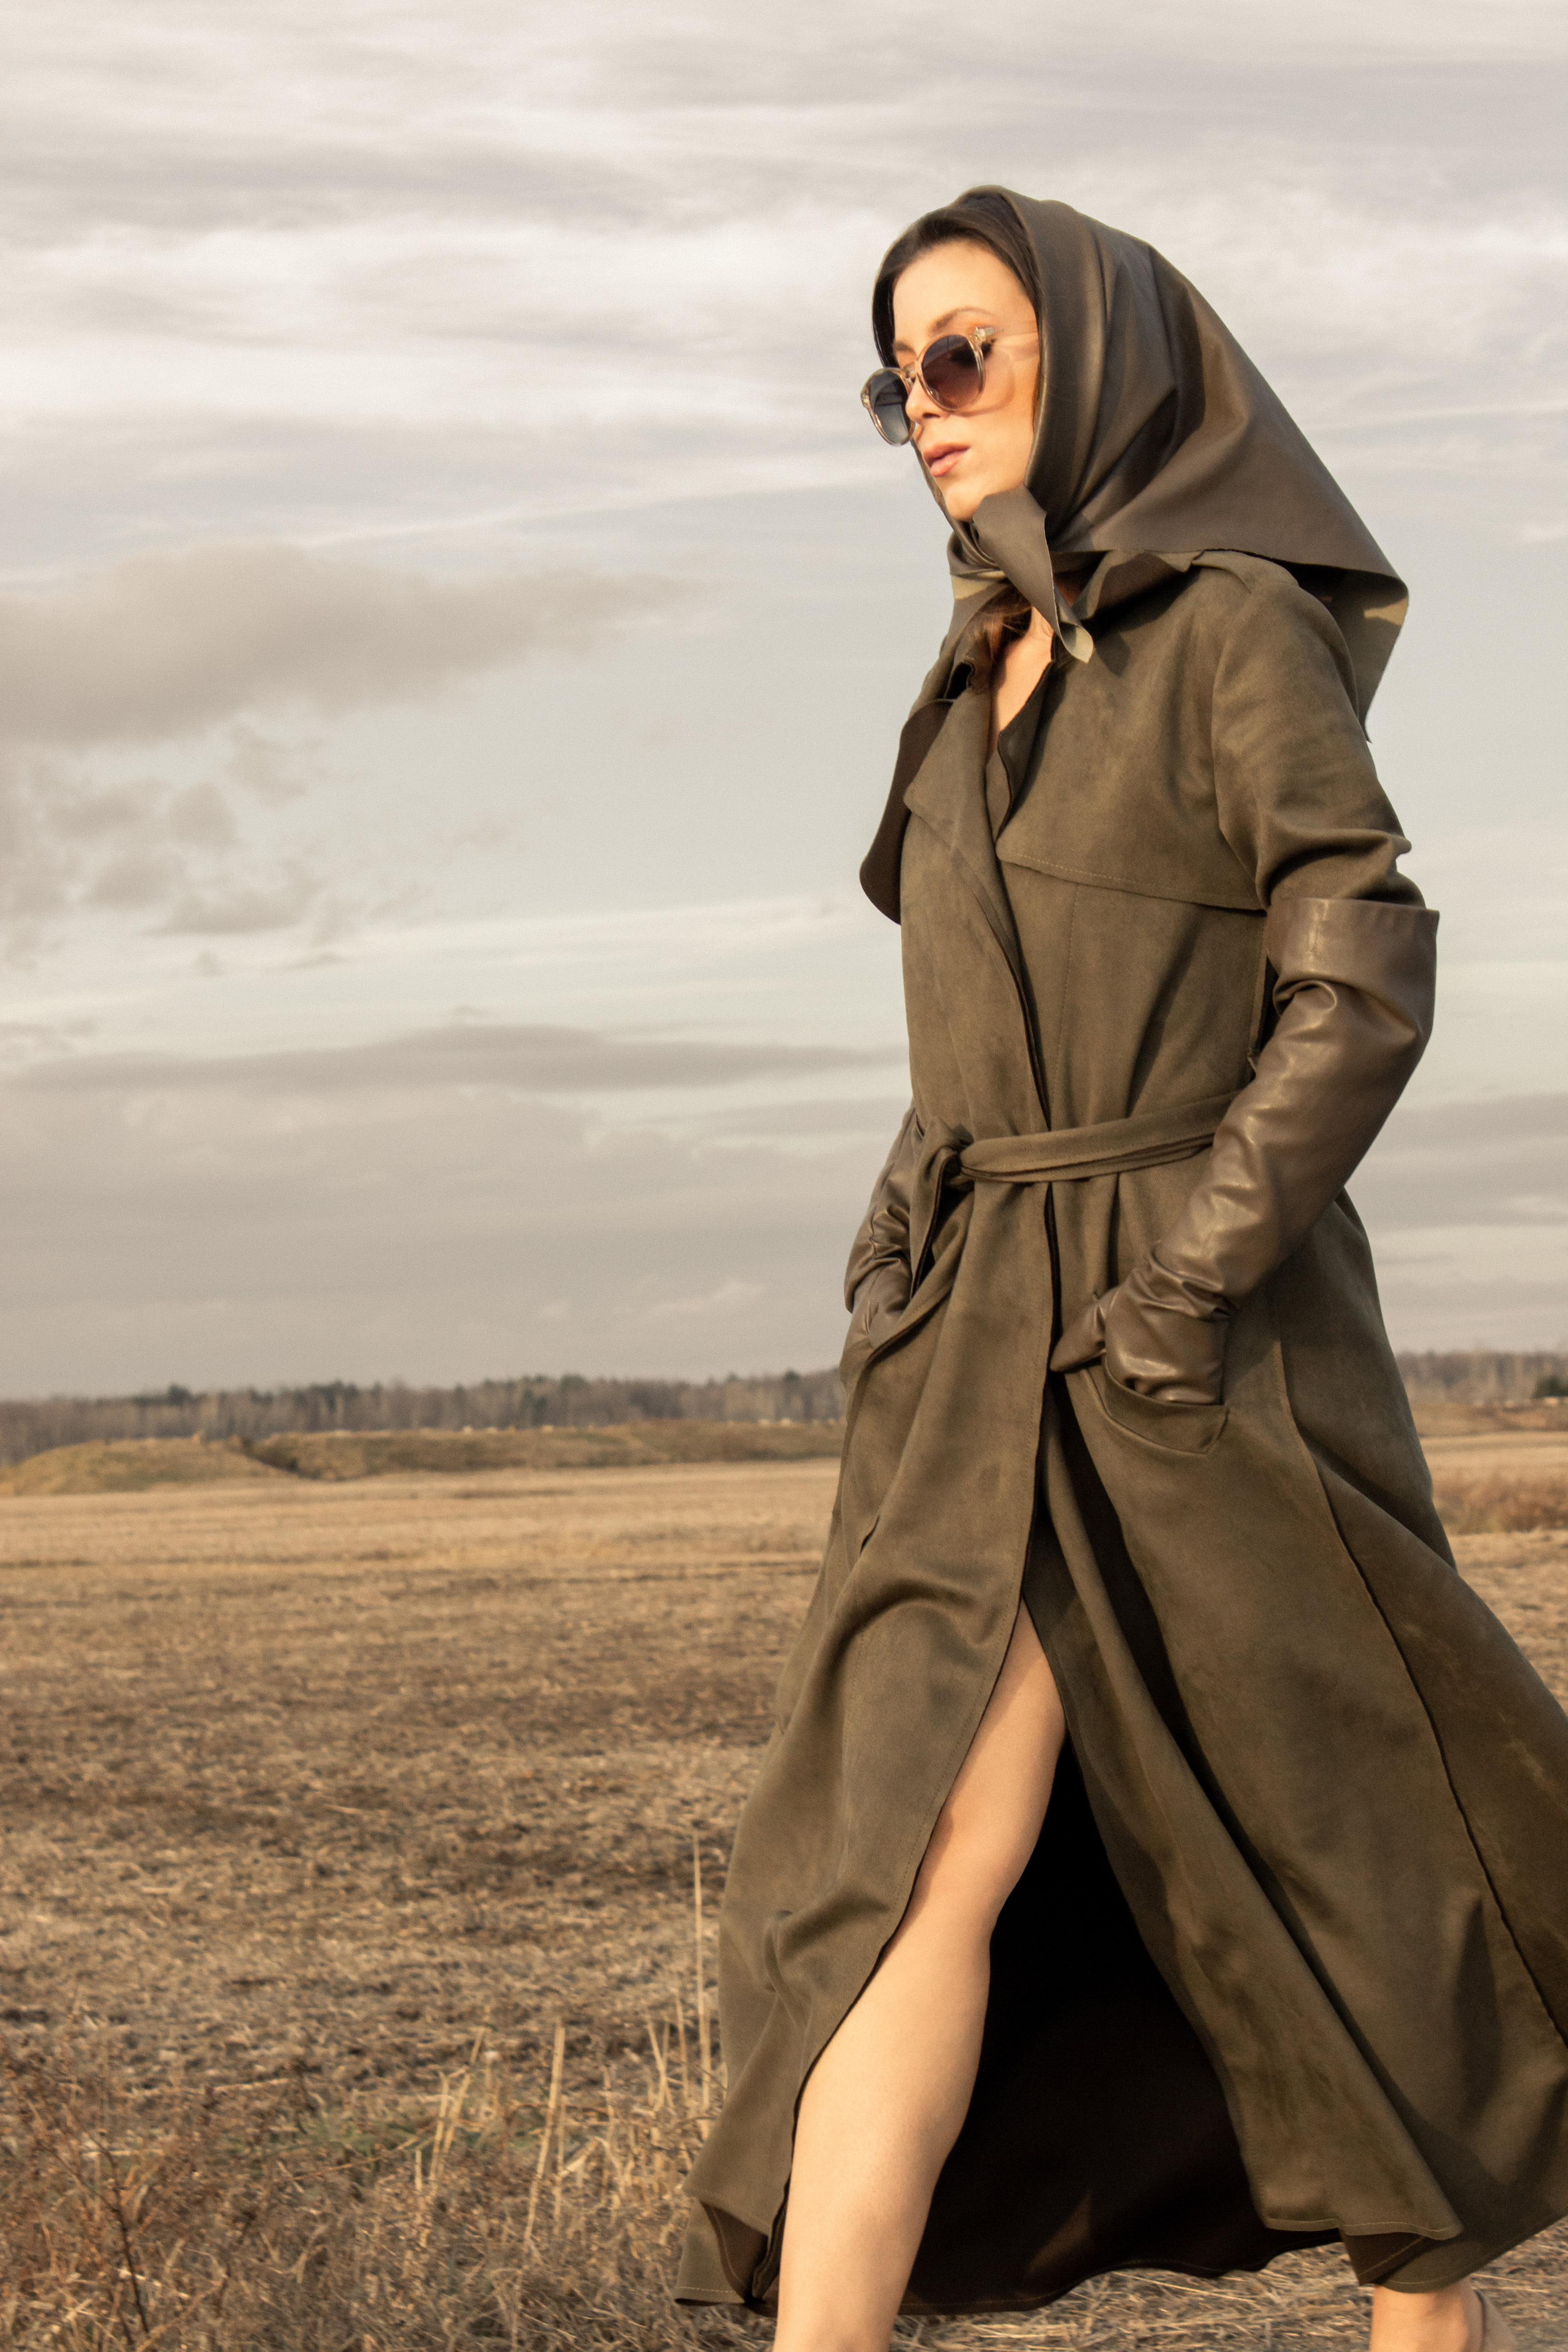 Woman wearing green vegan trench coat walking in the countryside